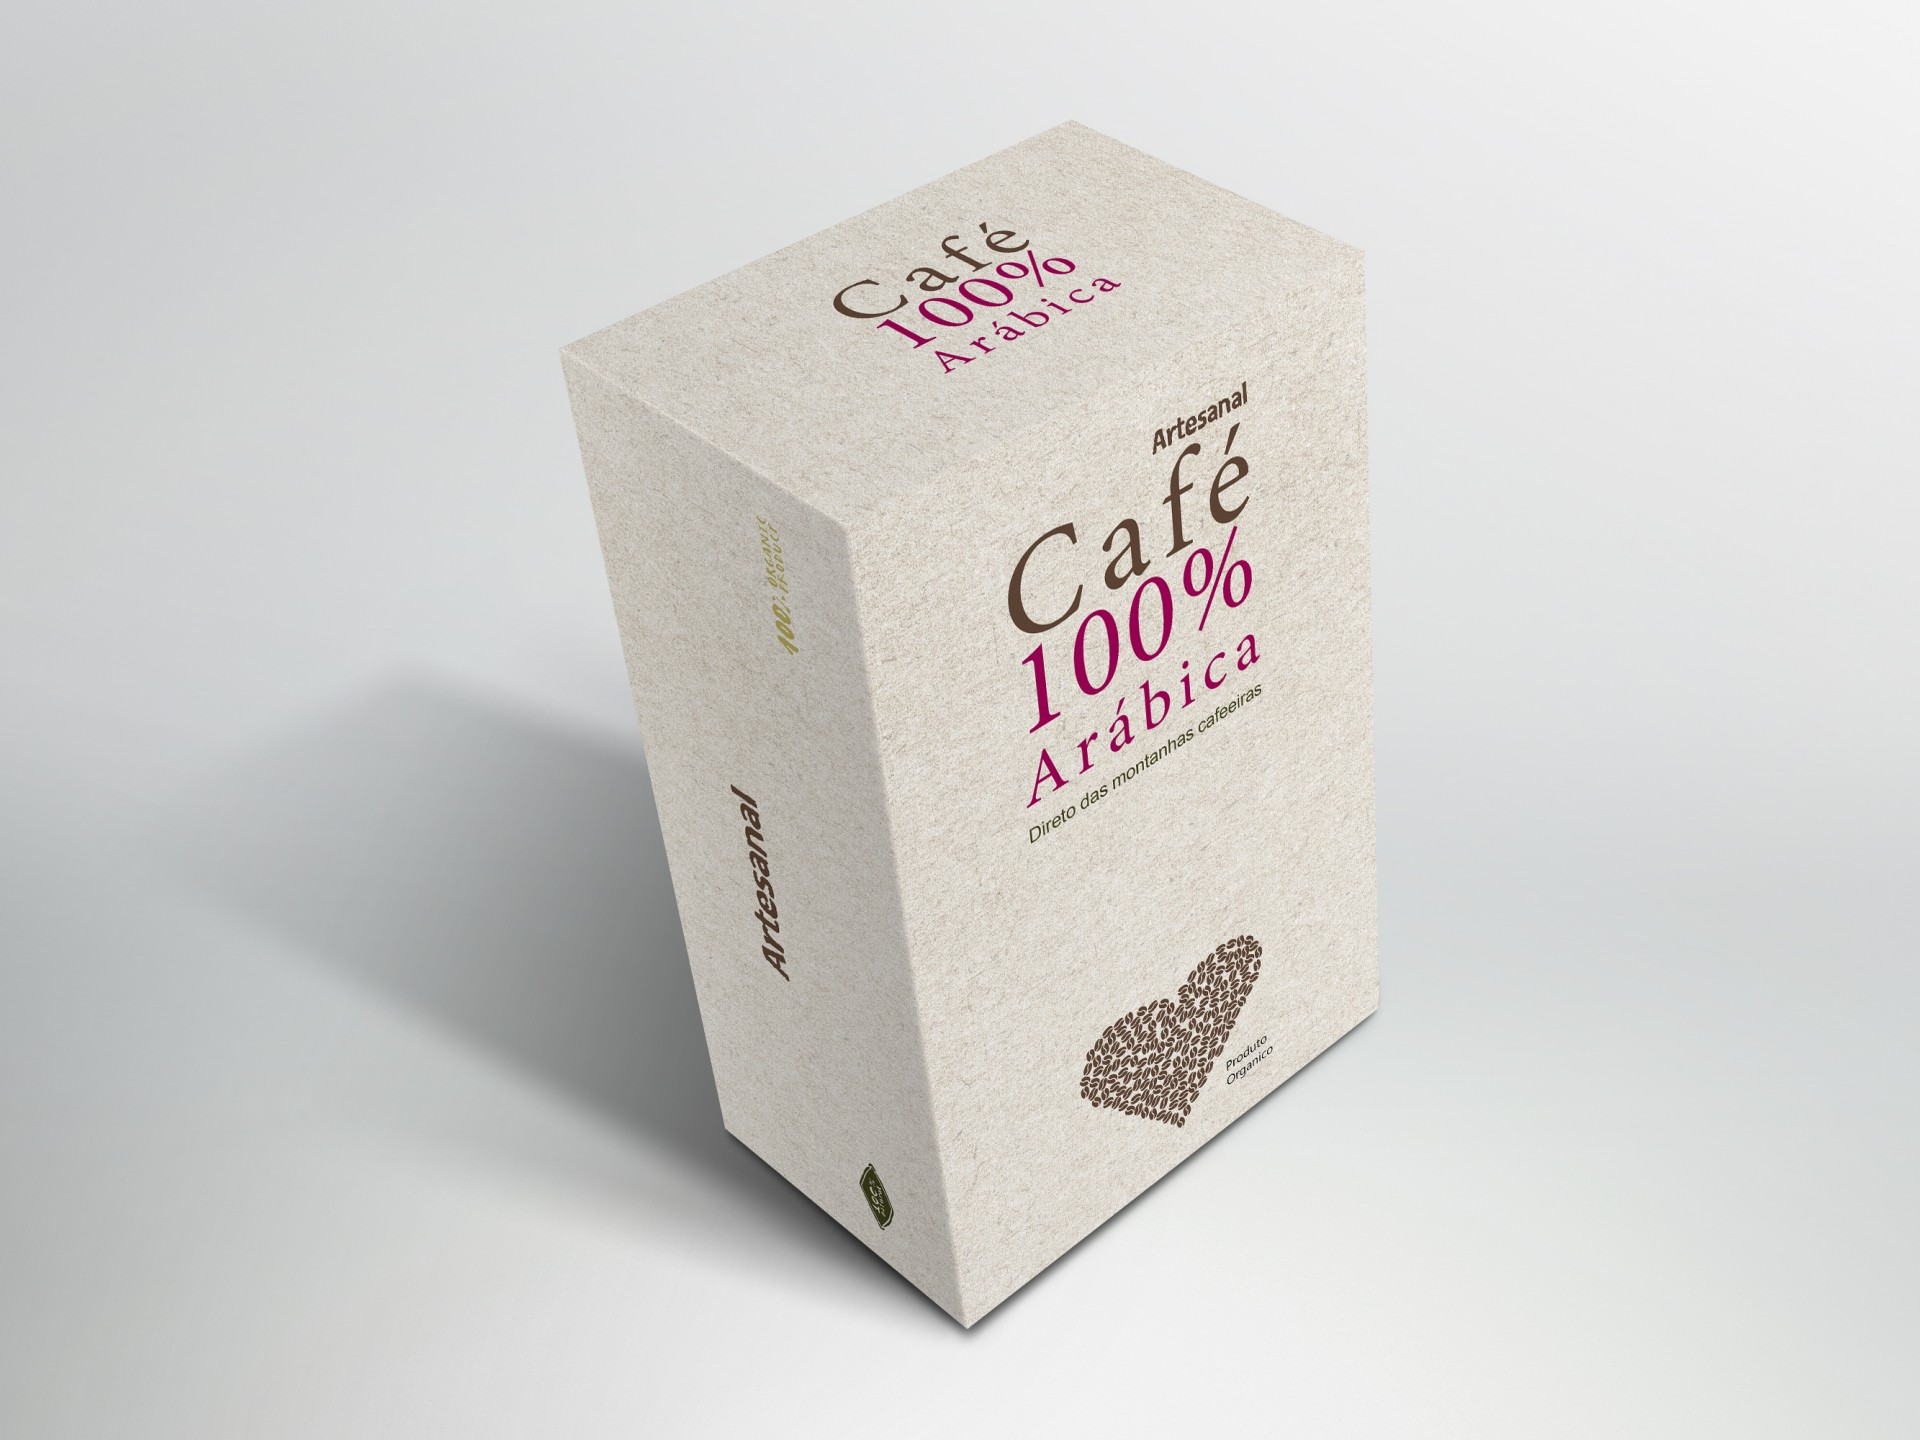 Cafe-Artesanal-do-Brasil-2